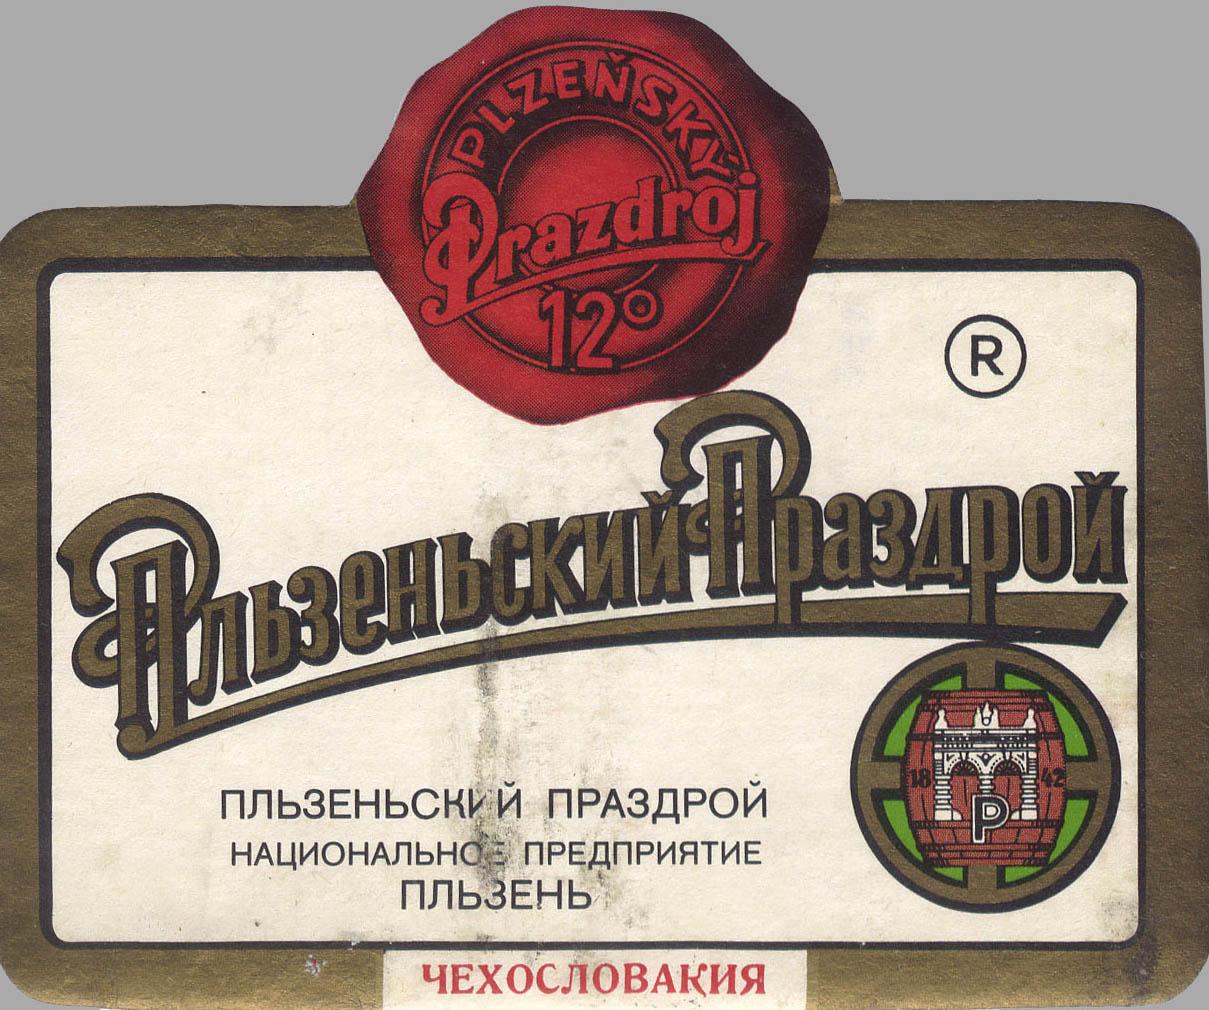 http://beerencyclopaedia.com/wp-content/gallery/czechoslovakia-plzen-prazdroi-rus/l_czechoslovakia-plzensky-prazdroi3.jpg